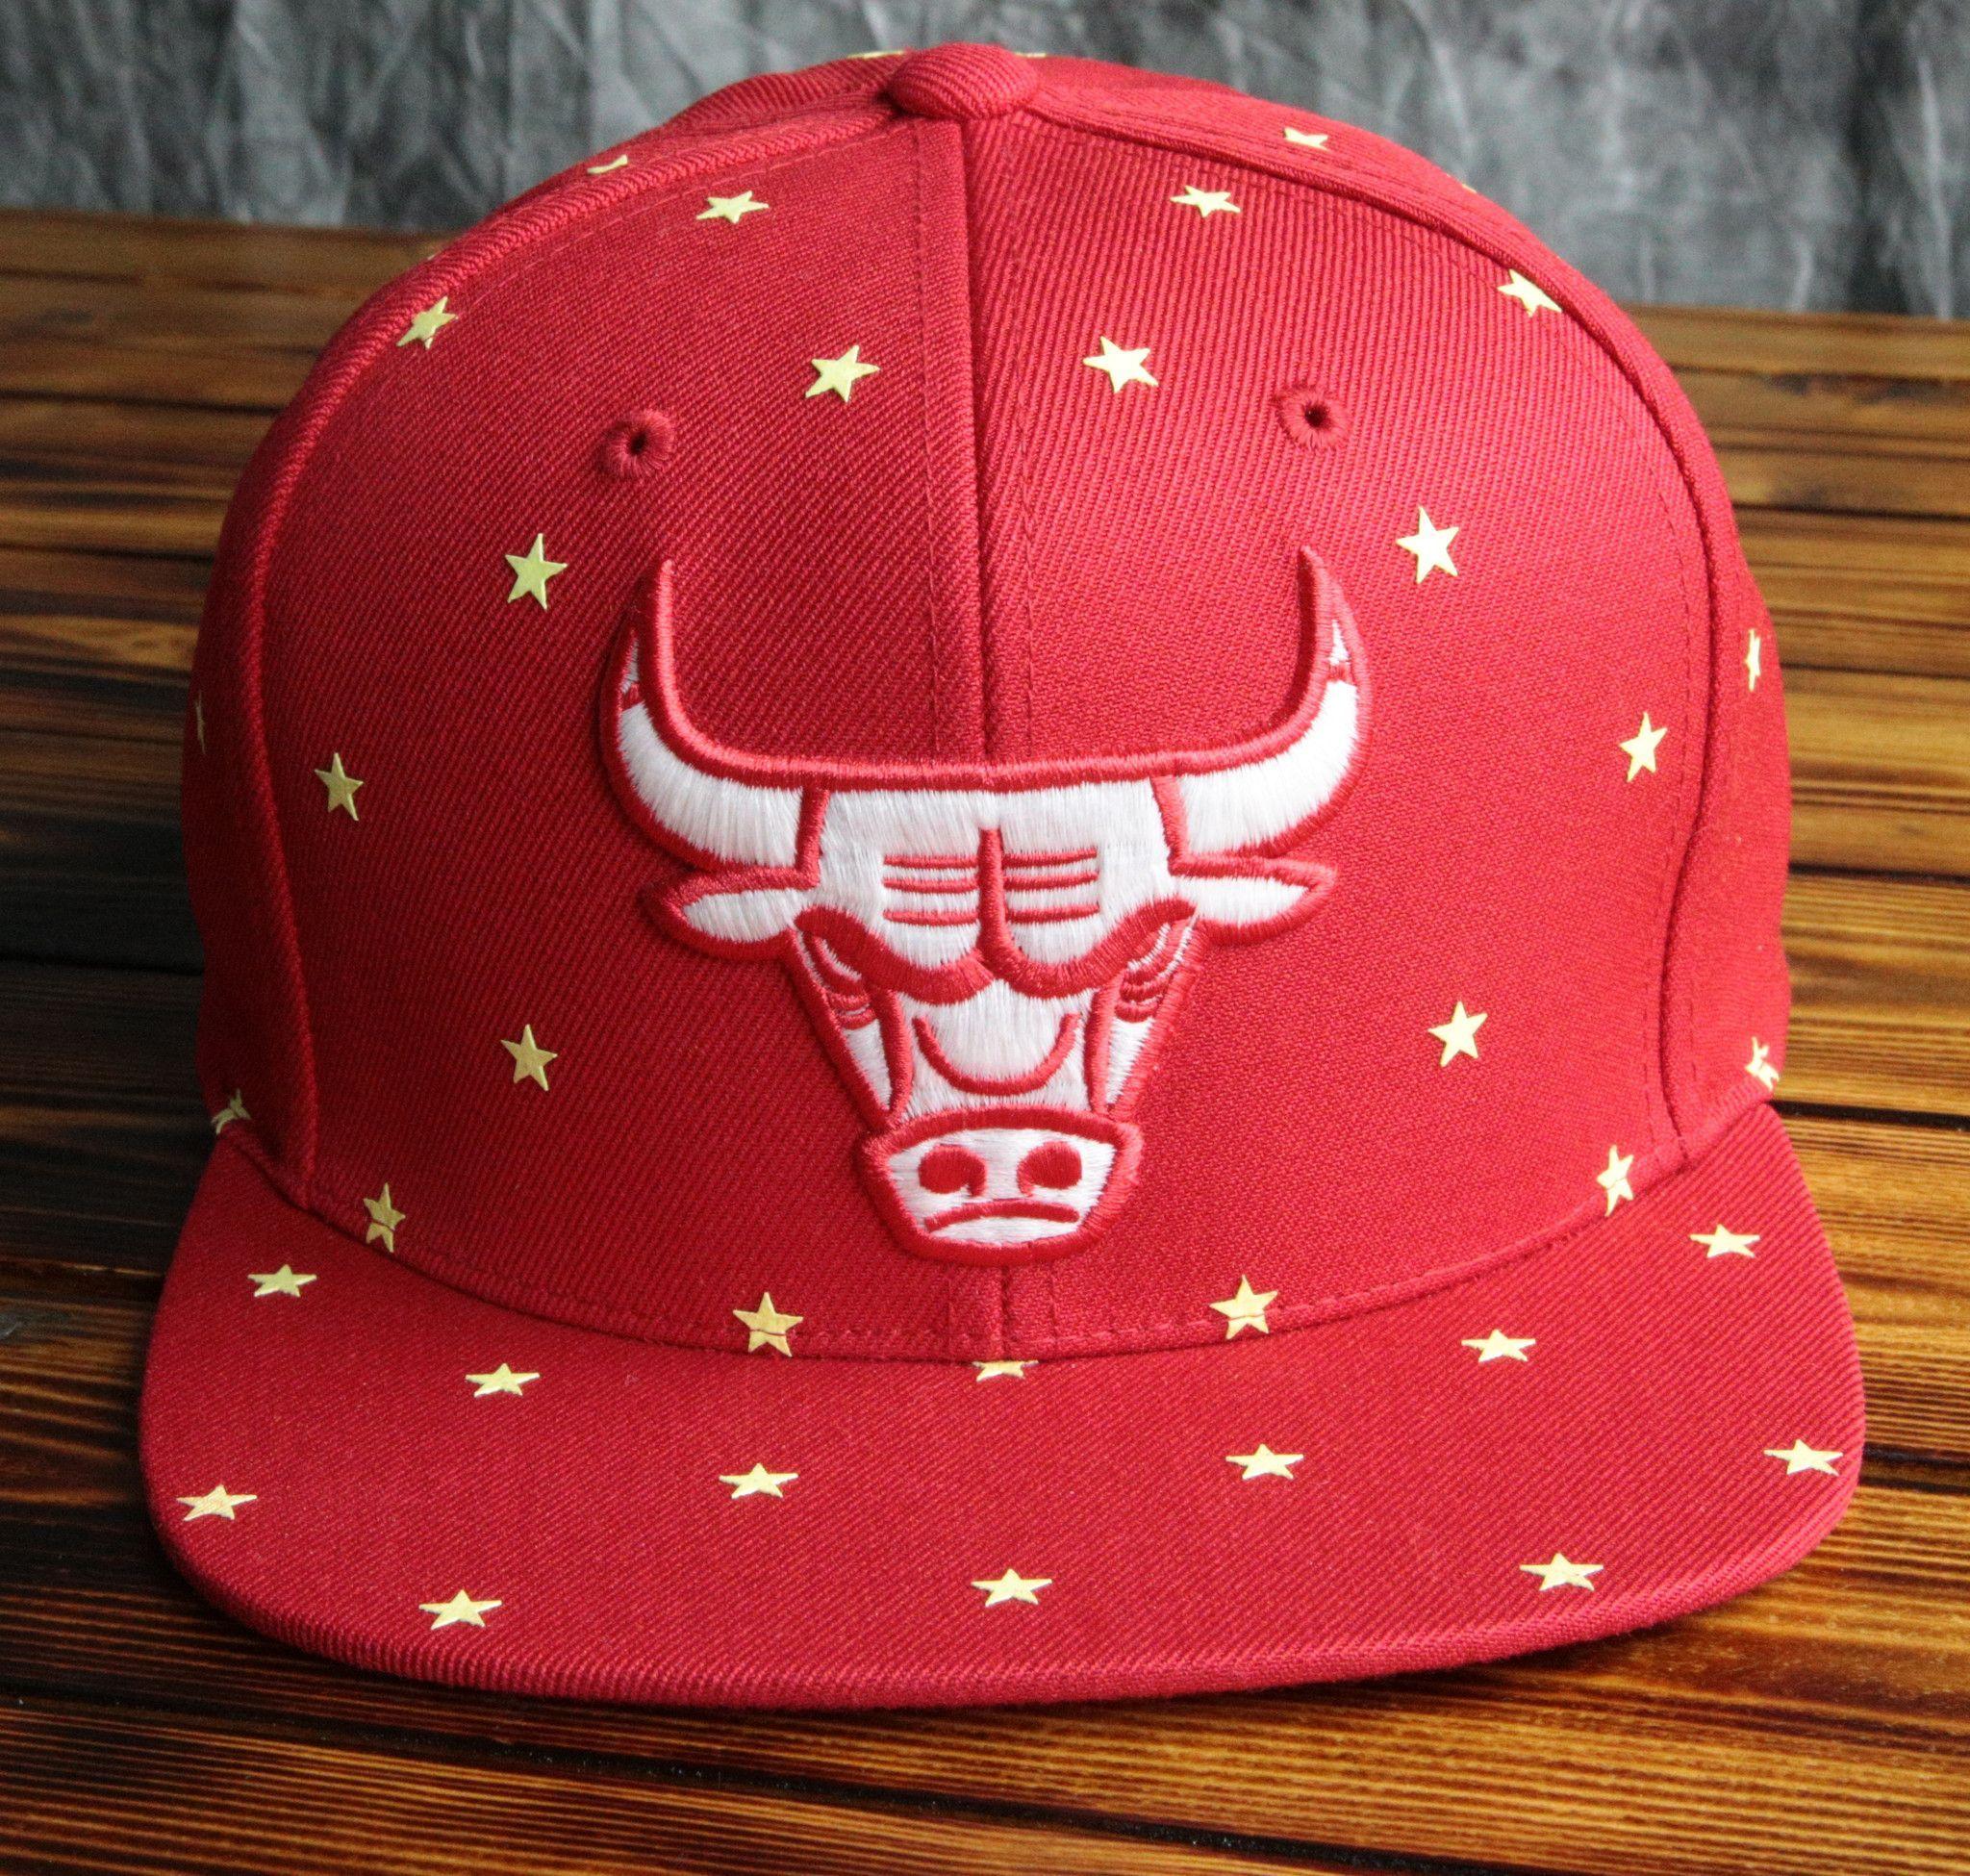 f35c1833 Chicago Bulls Mitchell & Ness Starry Night Glow in the Dark Snapback ...